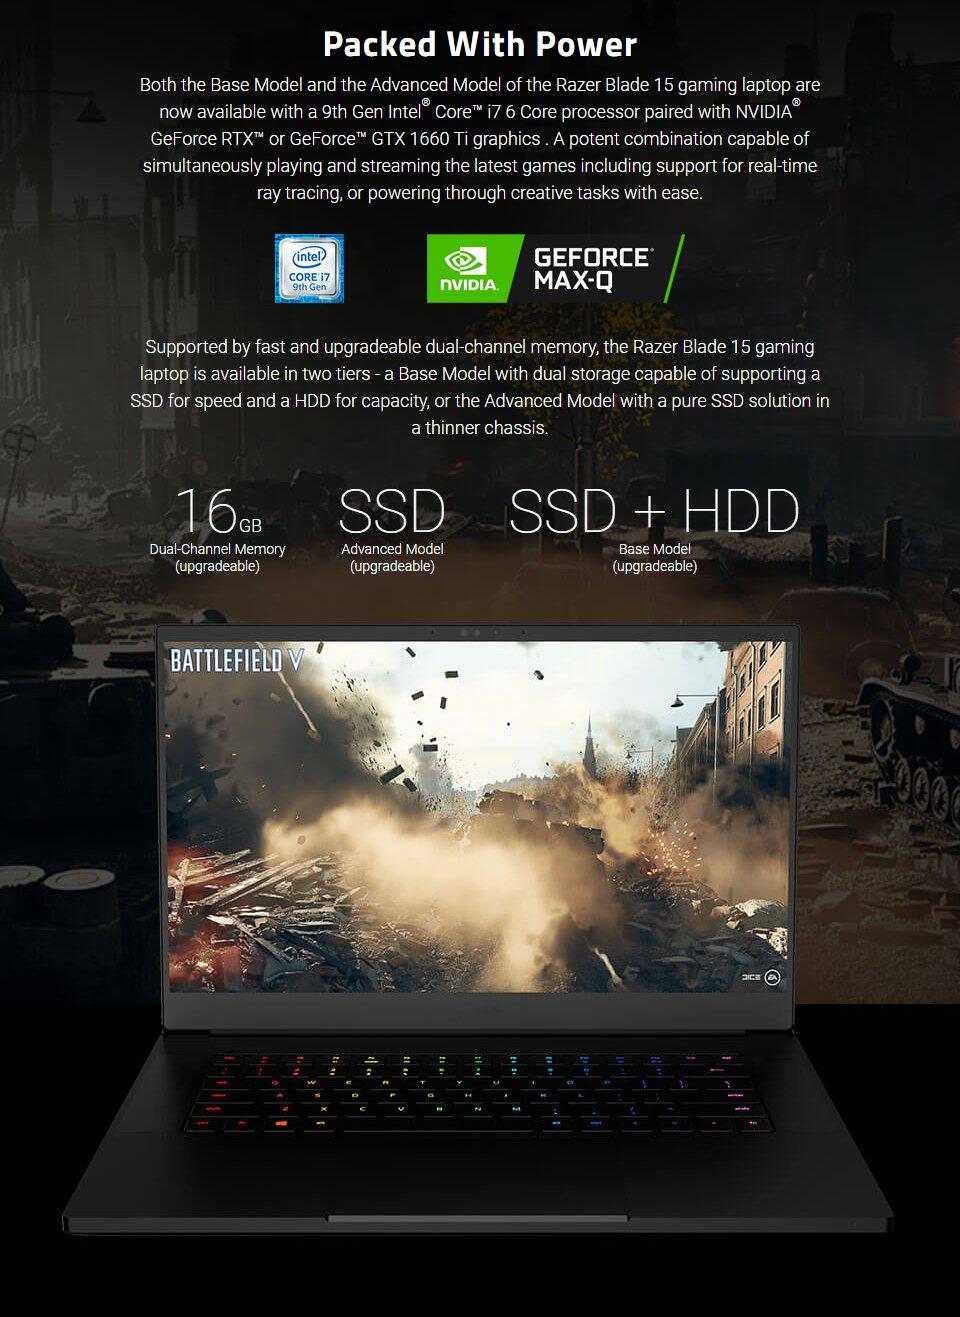 Razer Blade Core i7 RTX 2070 15.6in 240hz Notebook [03137E02] features 3